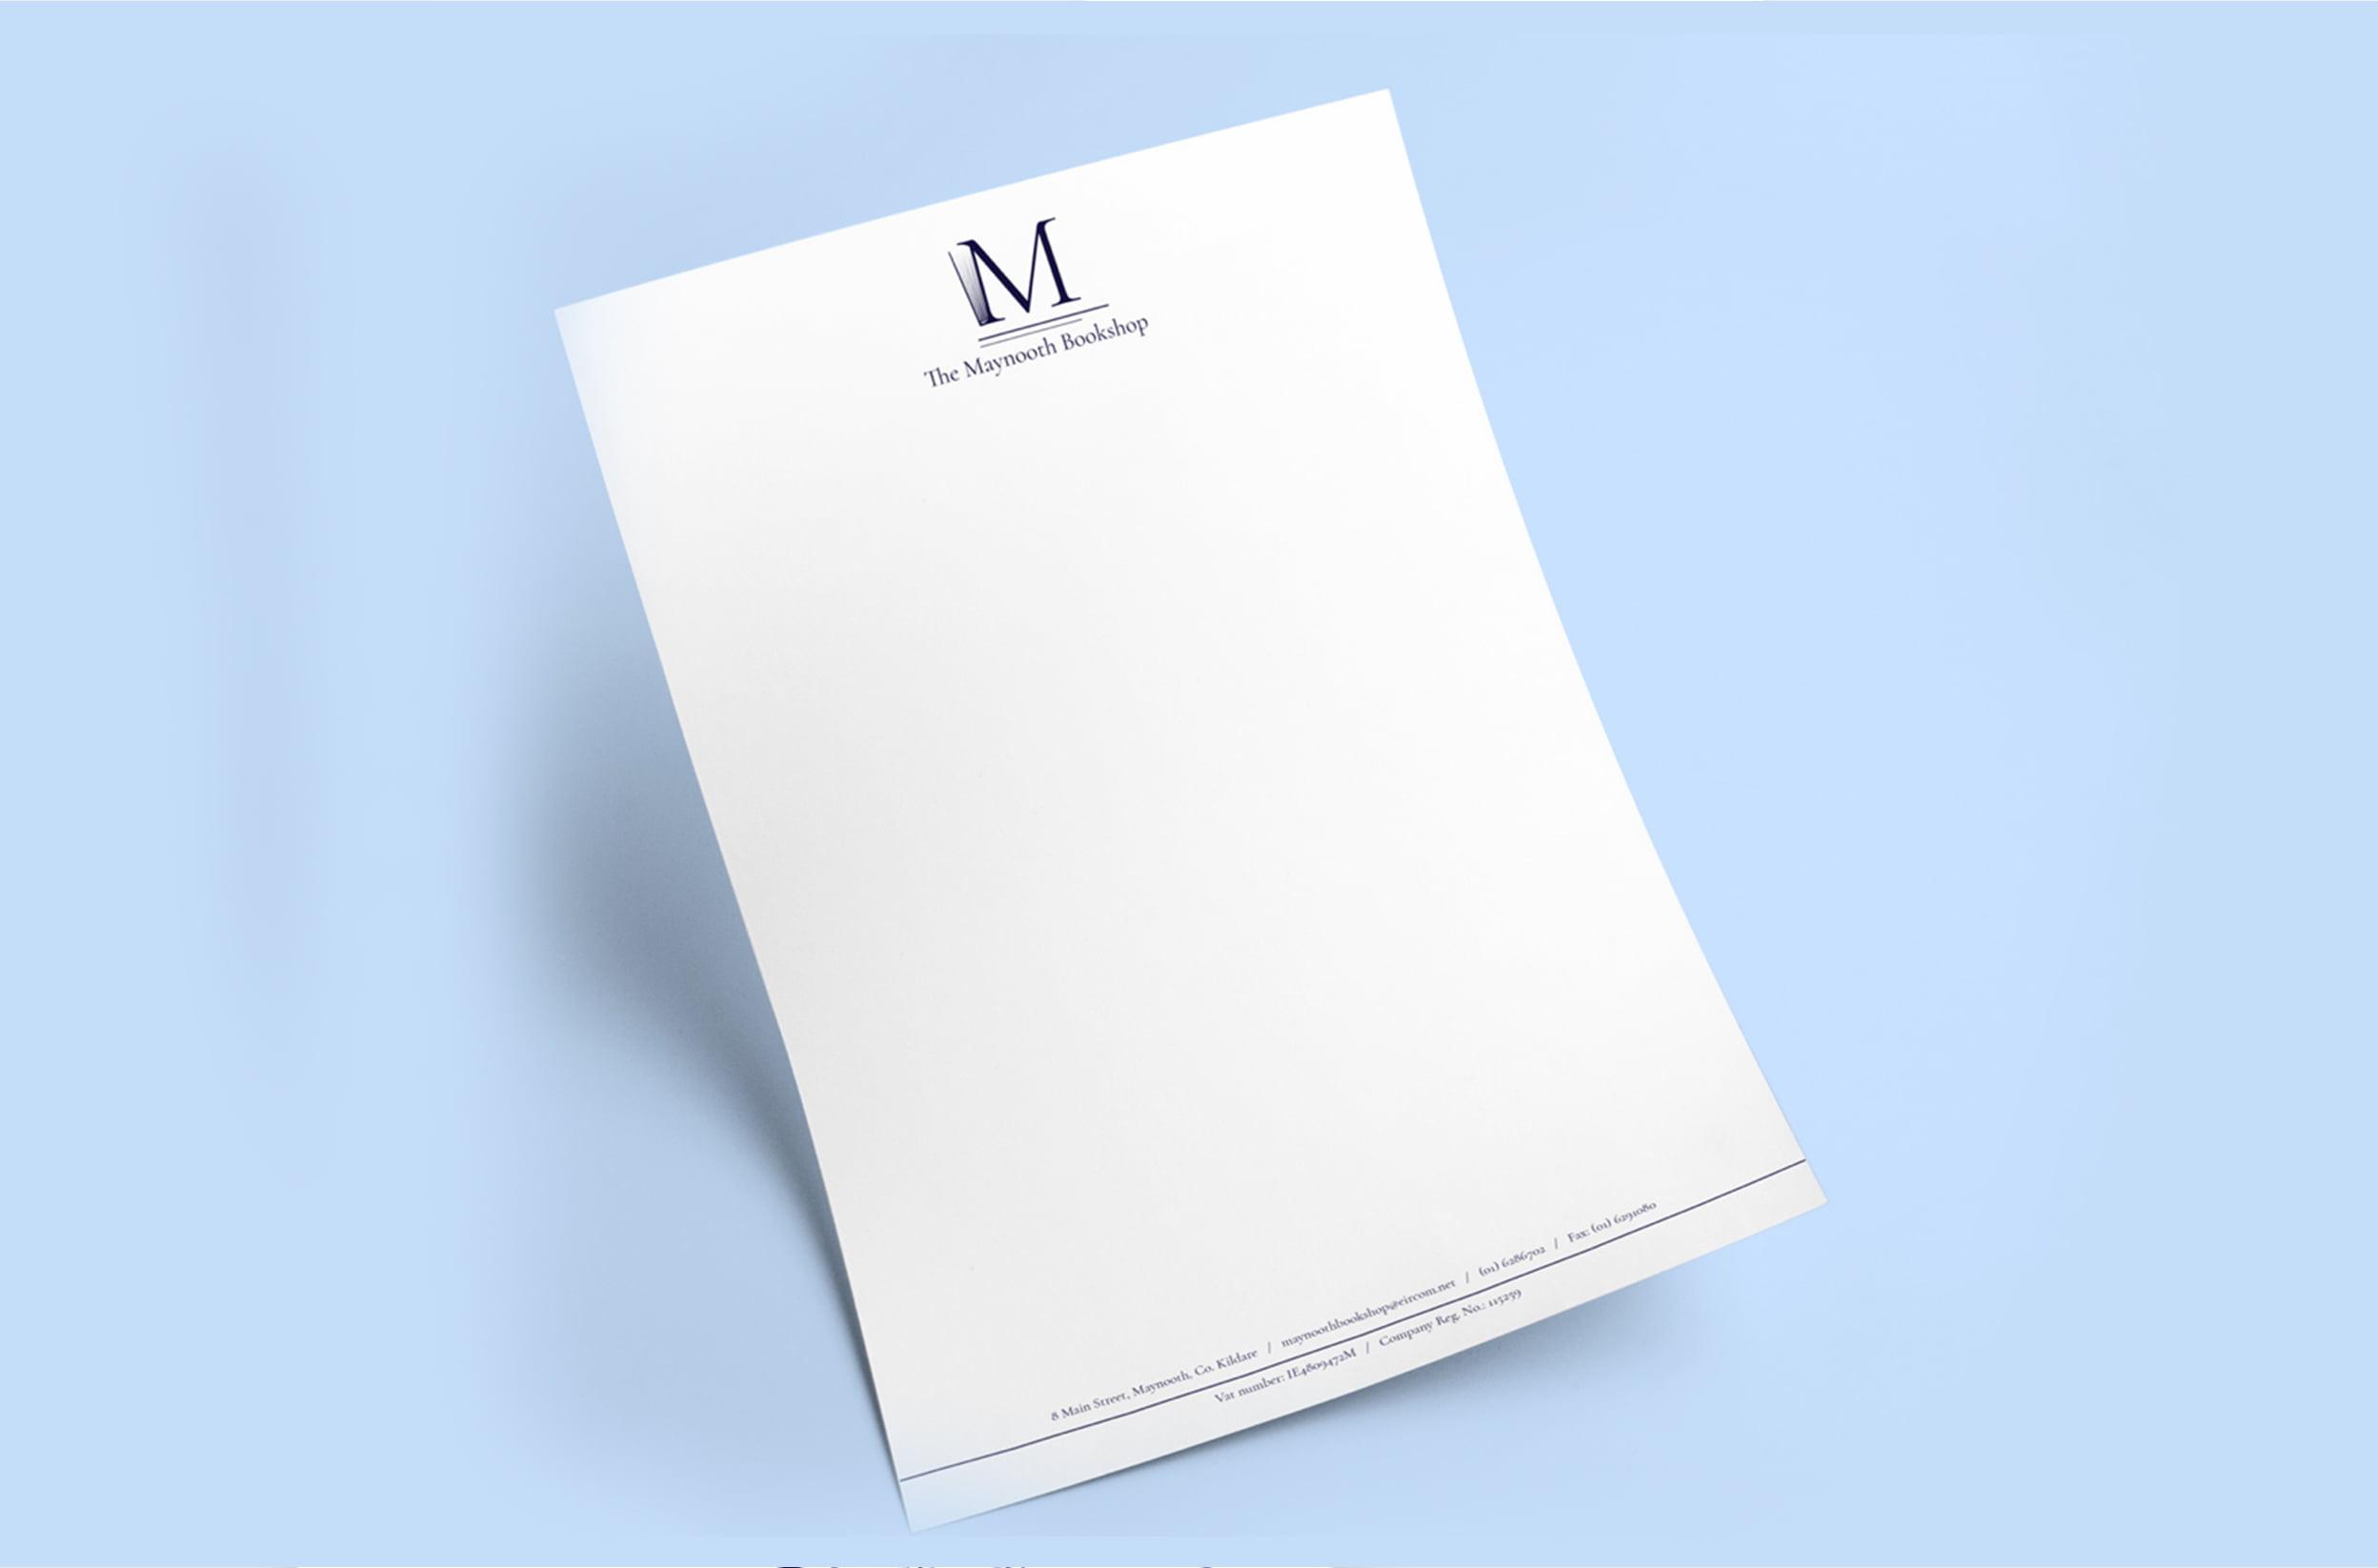 maynooth-book-8